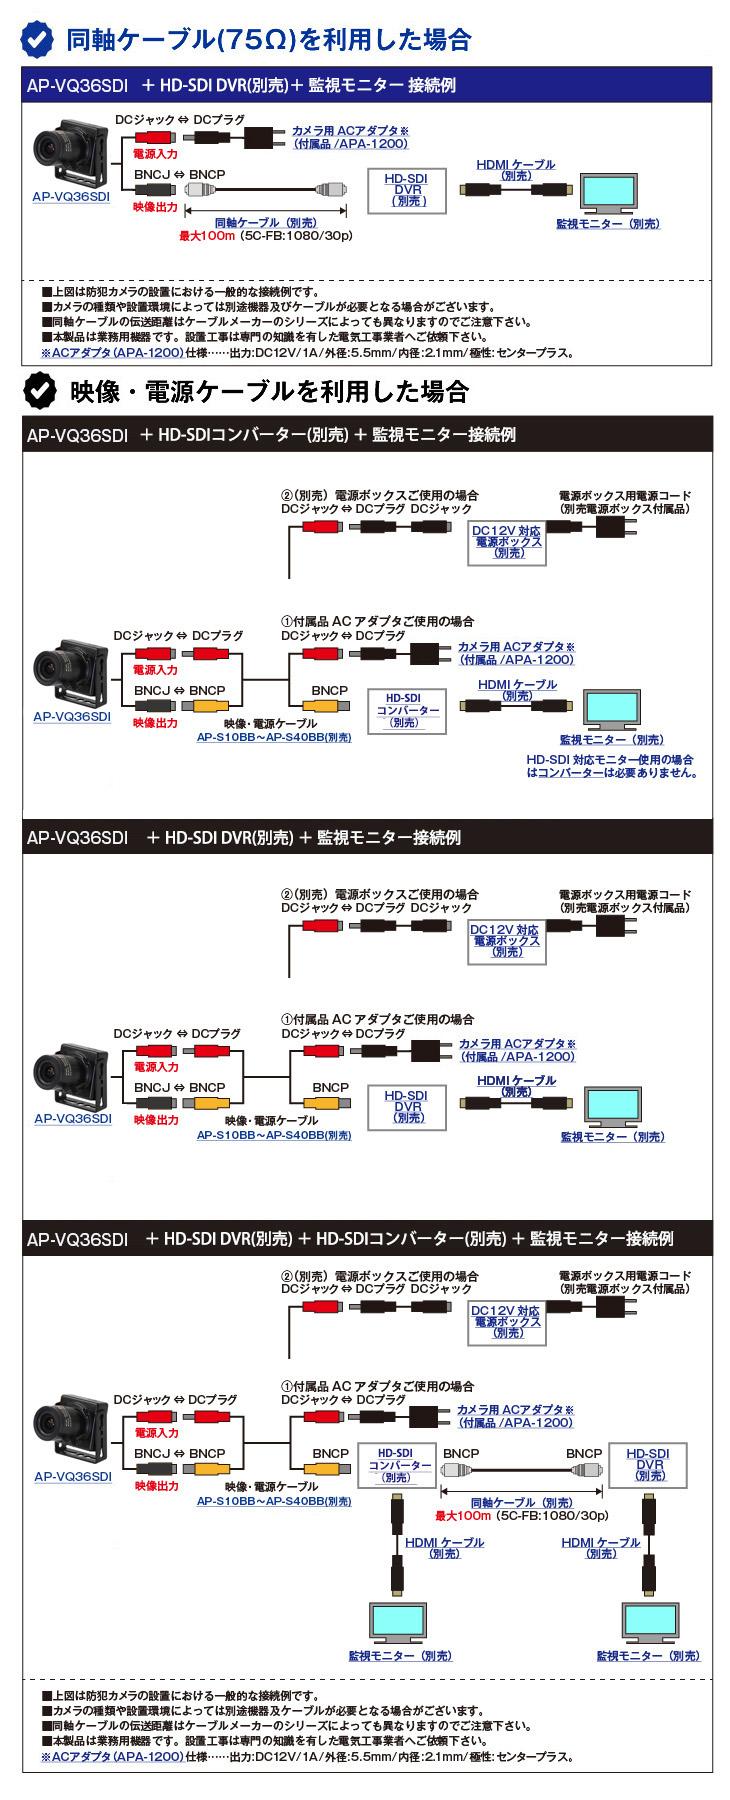 HD-SDI 218万画素防犯カメラ(AP-VQ36SDI)の接続イメージ